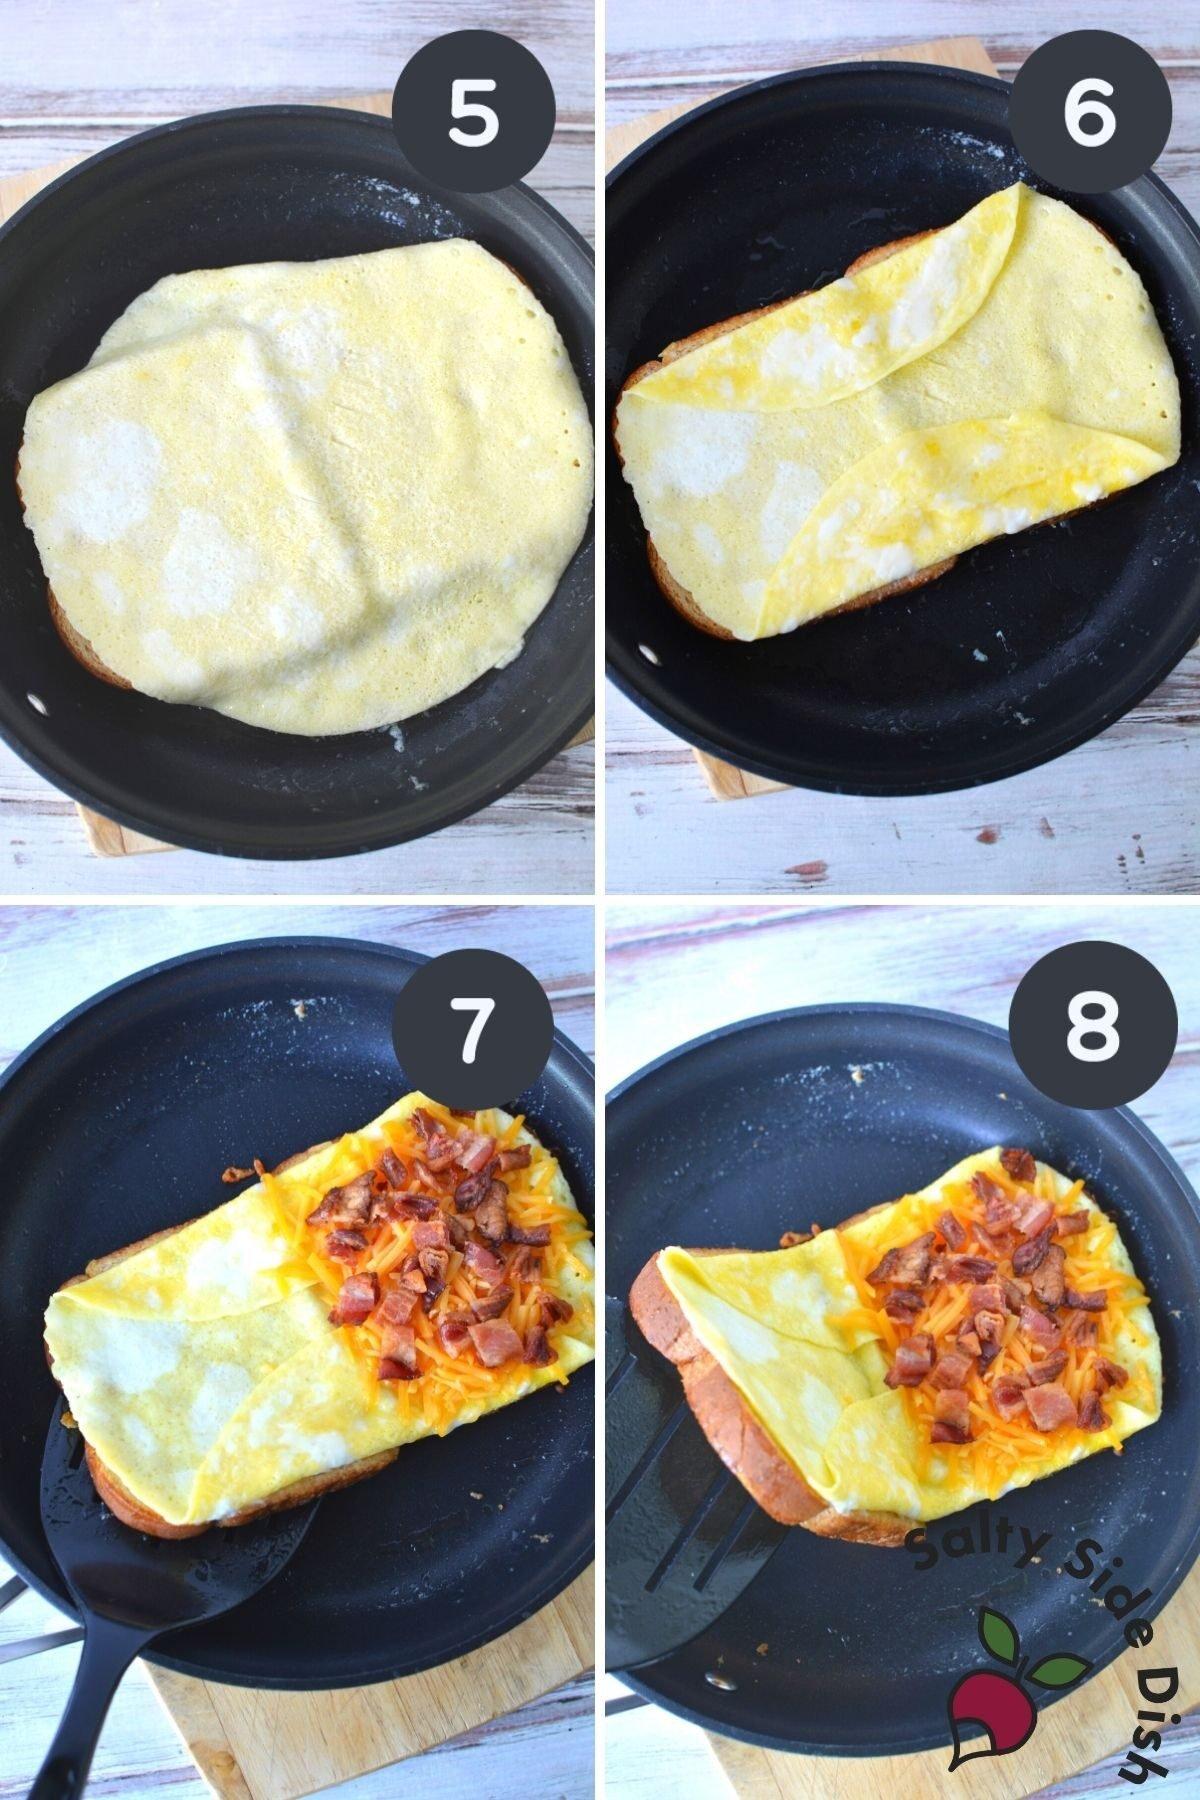 tiktok viral egg sandwich in a skillet.